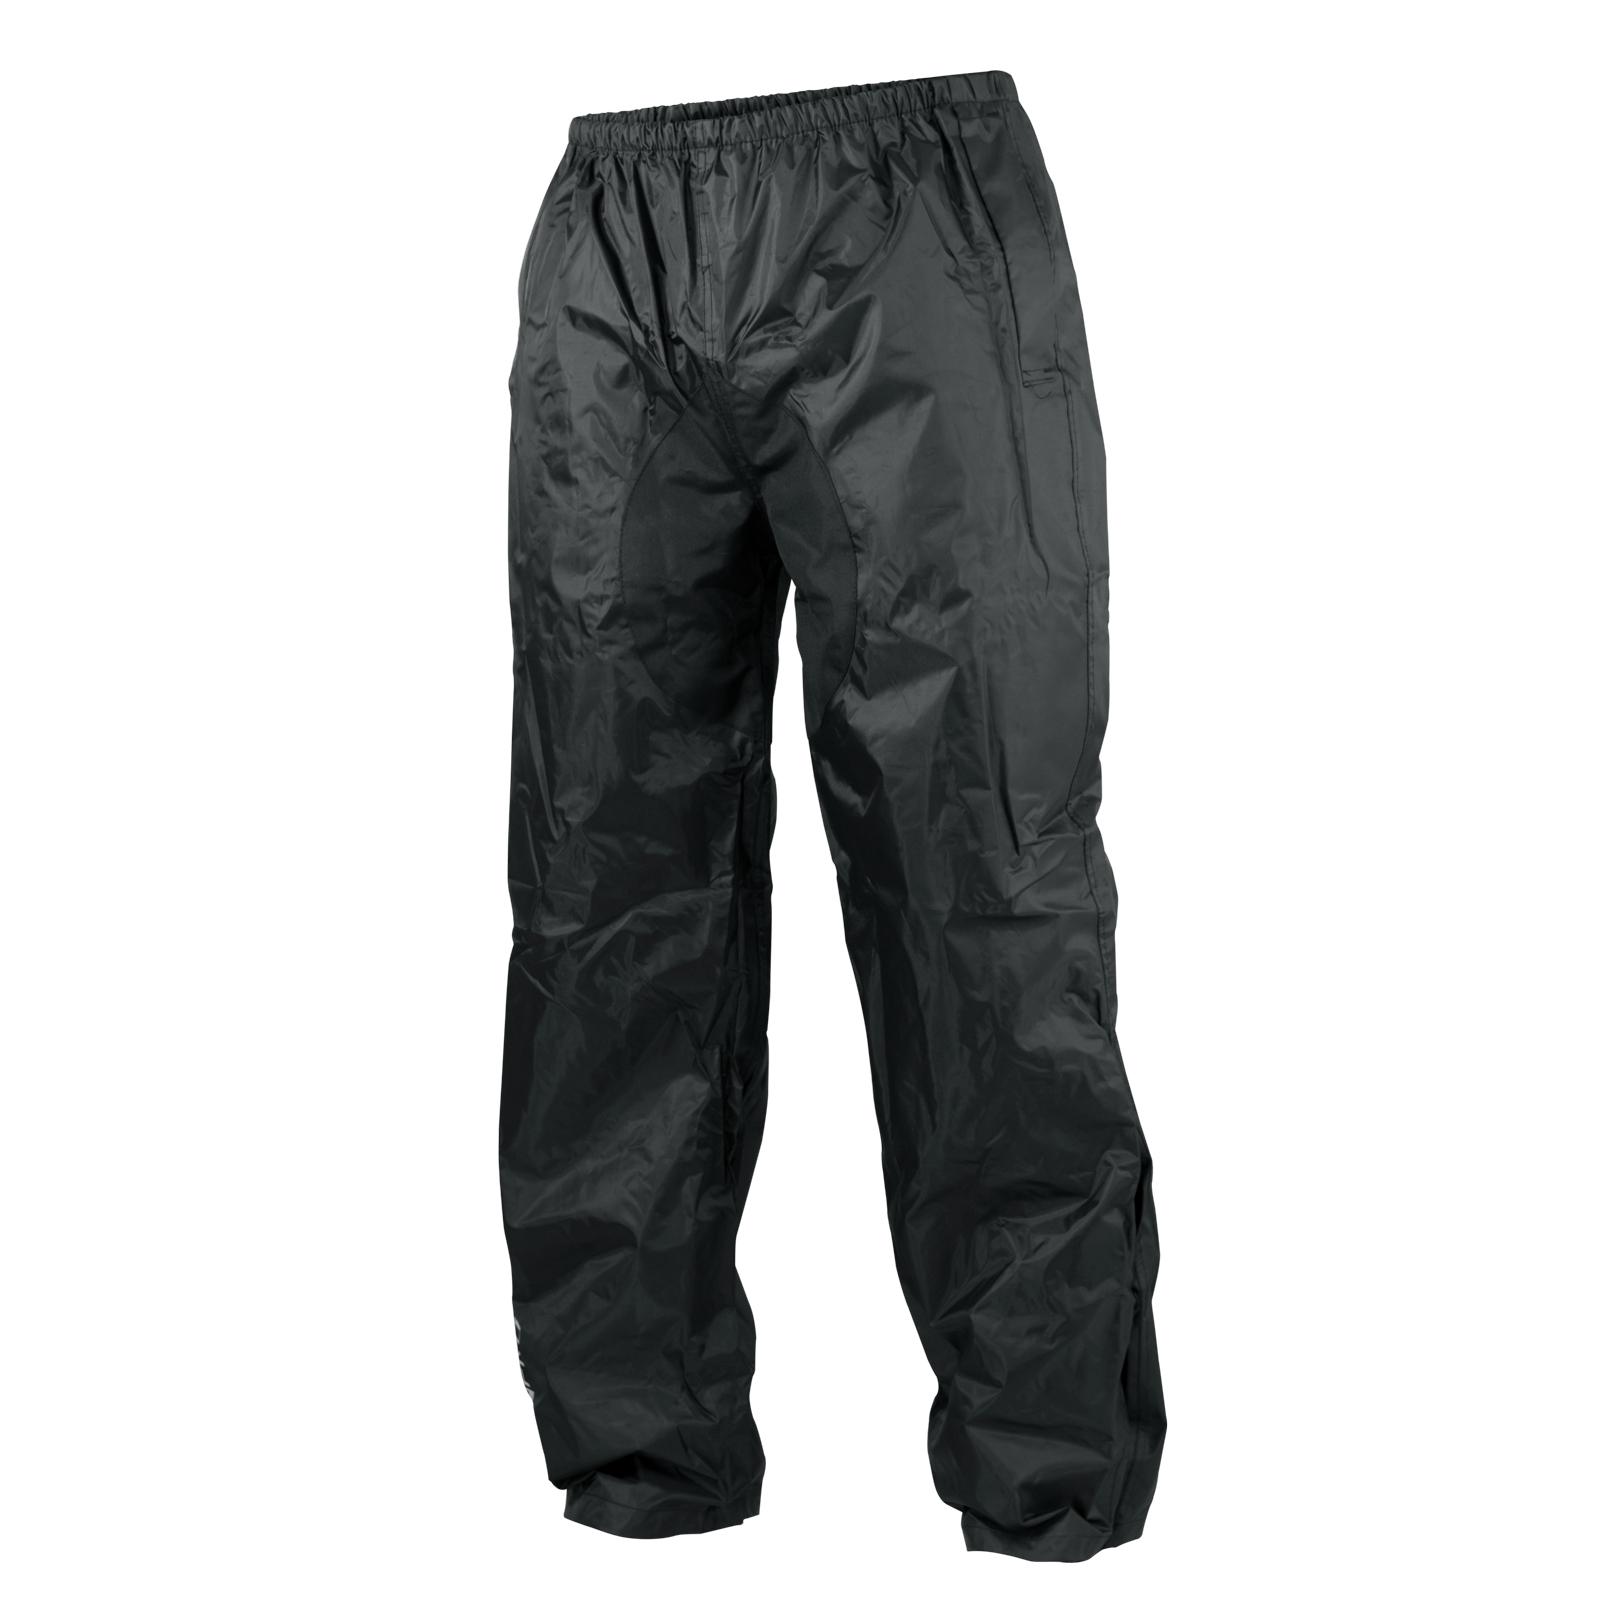 Pantalon-100-Impermeable-Motard-Moto-Unisex-Protection-Pluie-Unisexe